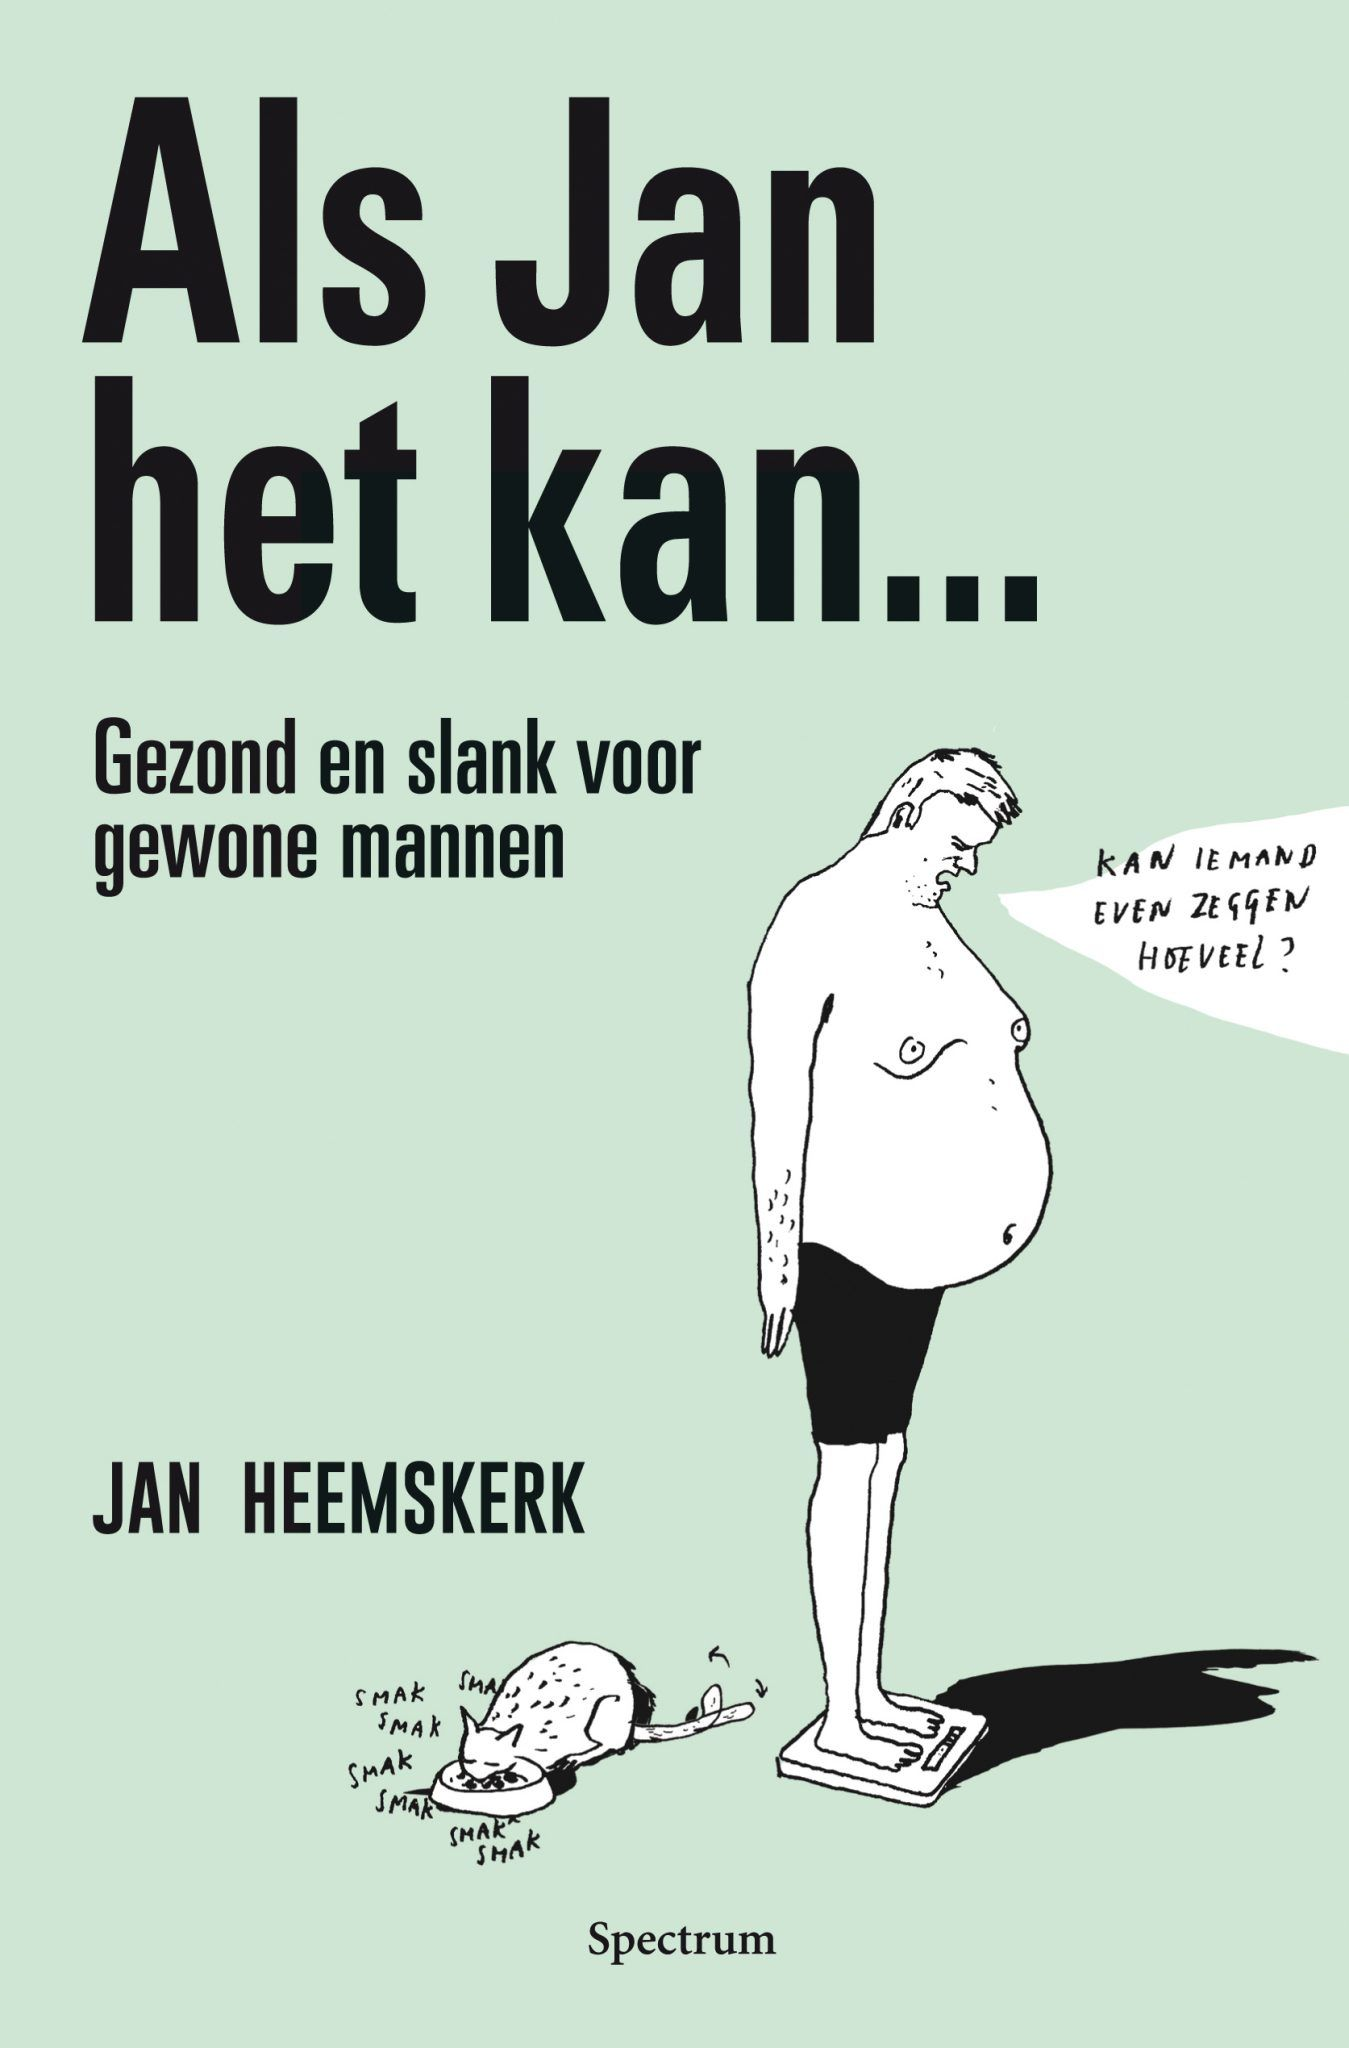 Jan Heemskerk, gezond, boek, playboy